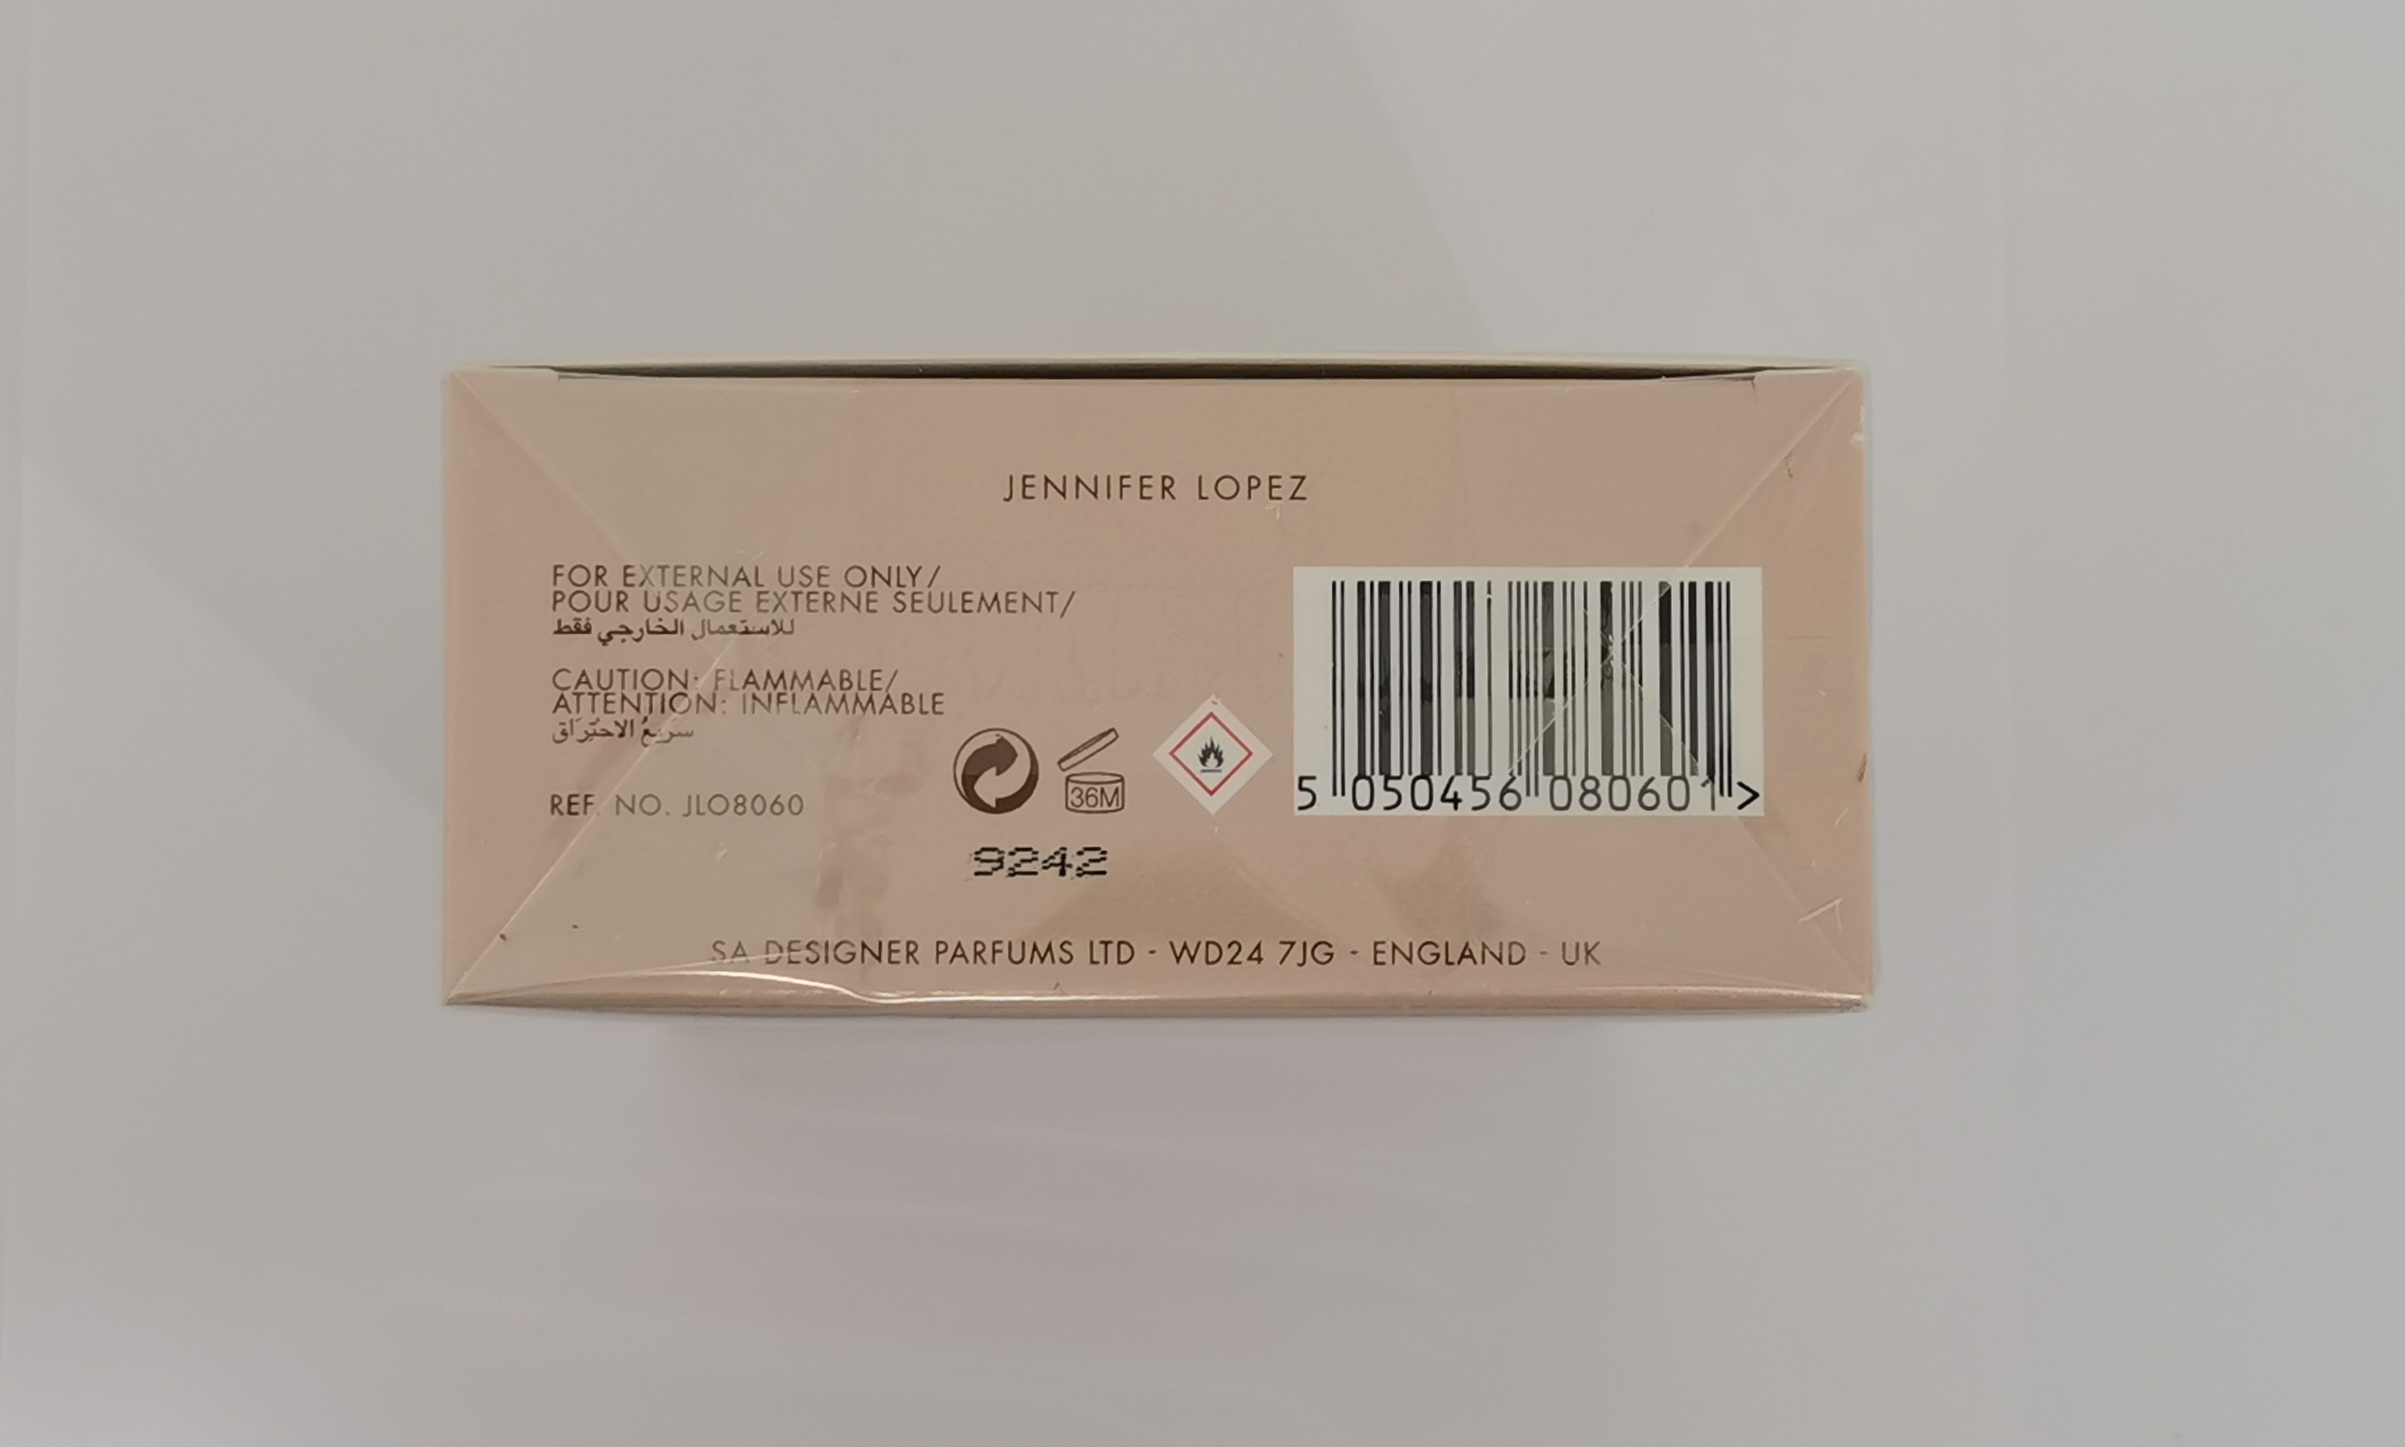 Парфюмерная вода 100 мл Jennifer Lopez Still - фото штрих-кода и батч-кода на коробке